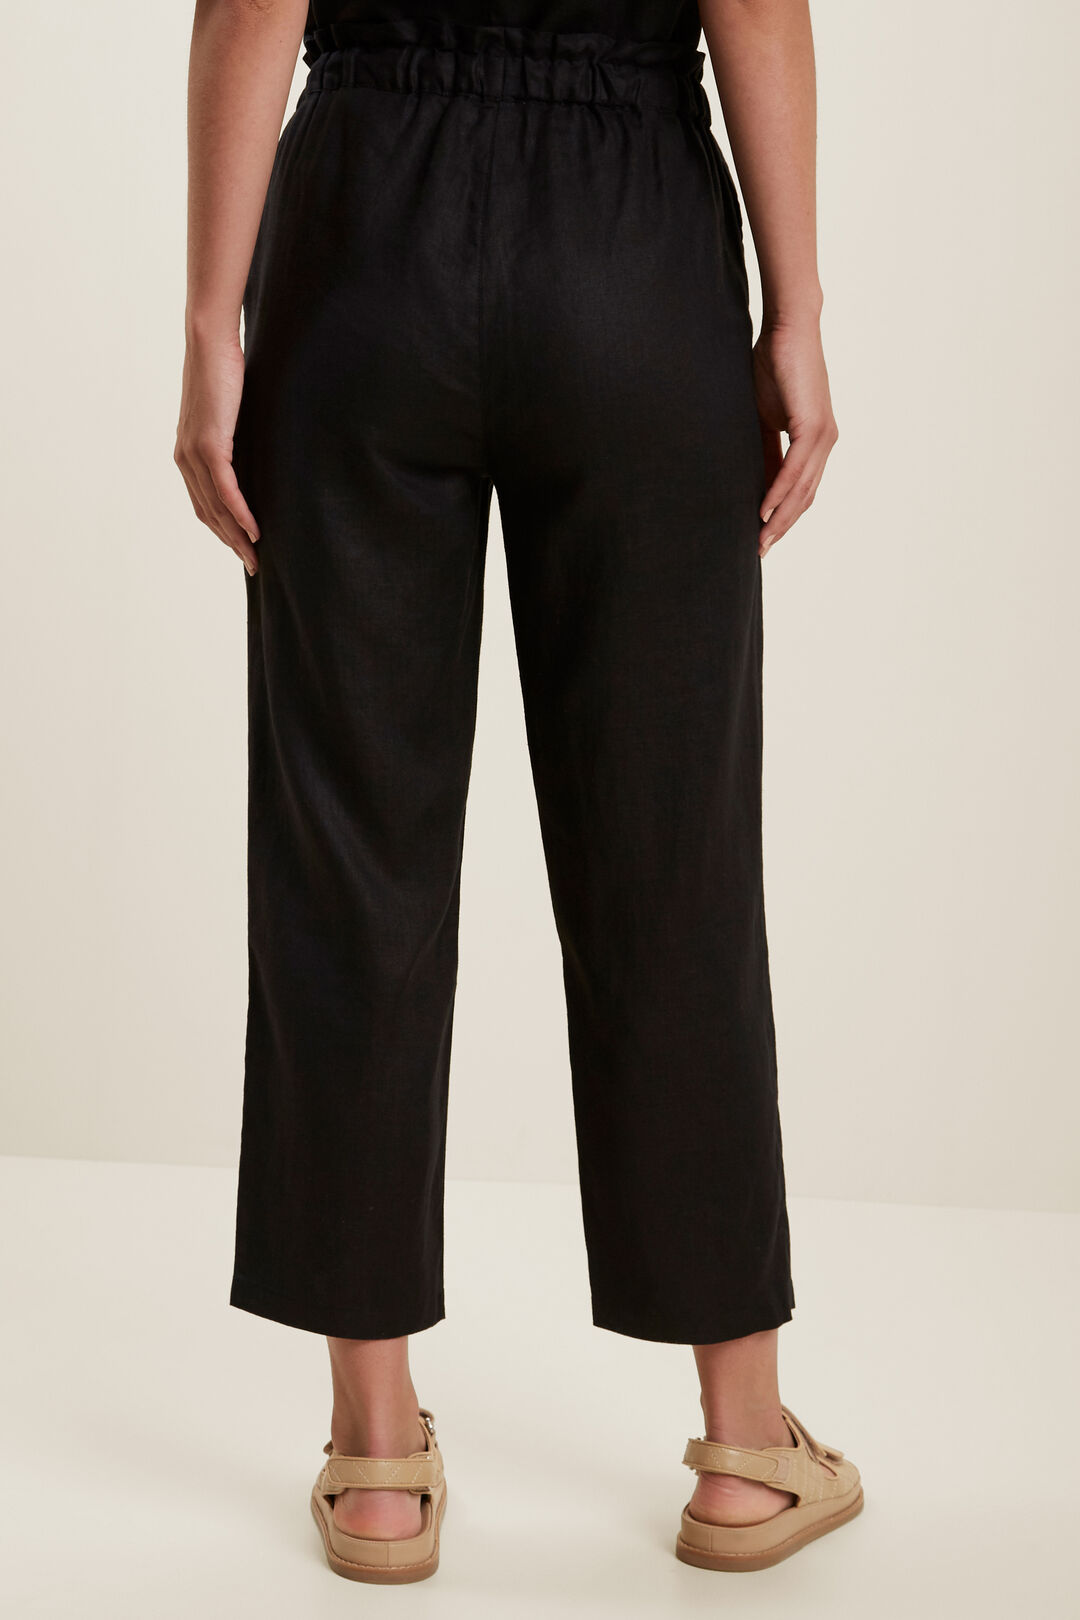 Linen Tie Up Pants  BLACK  hi-res